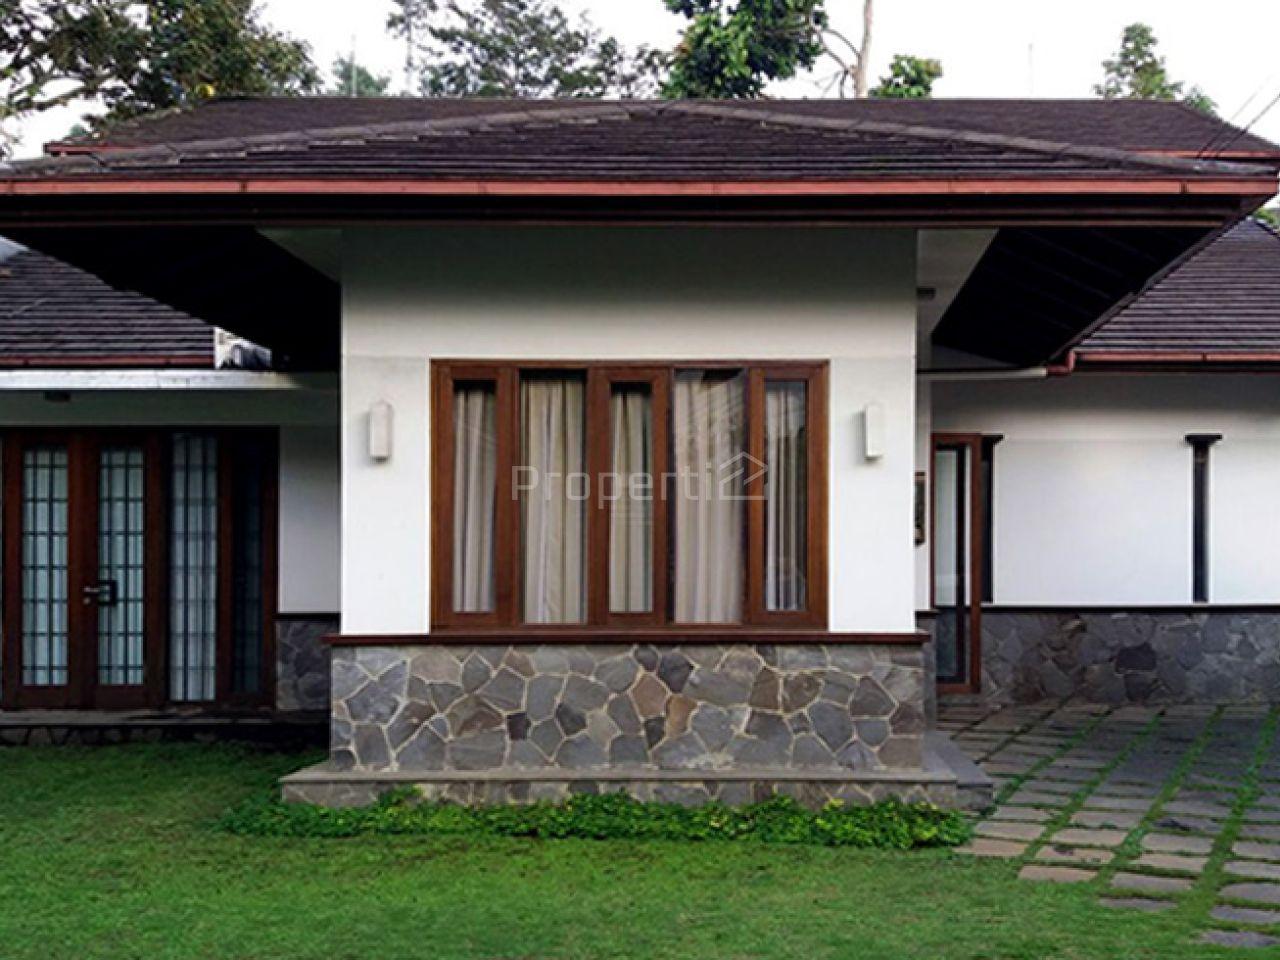 Rumah Elok dengan Nuansa Alami Modern dan Pekarangan Sangat Luas, Jawa Barat